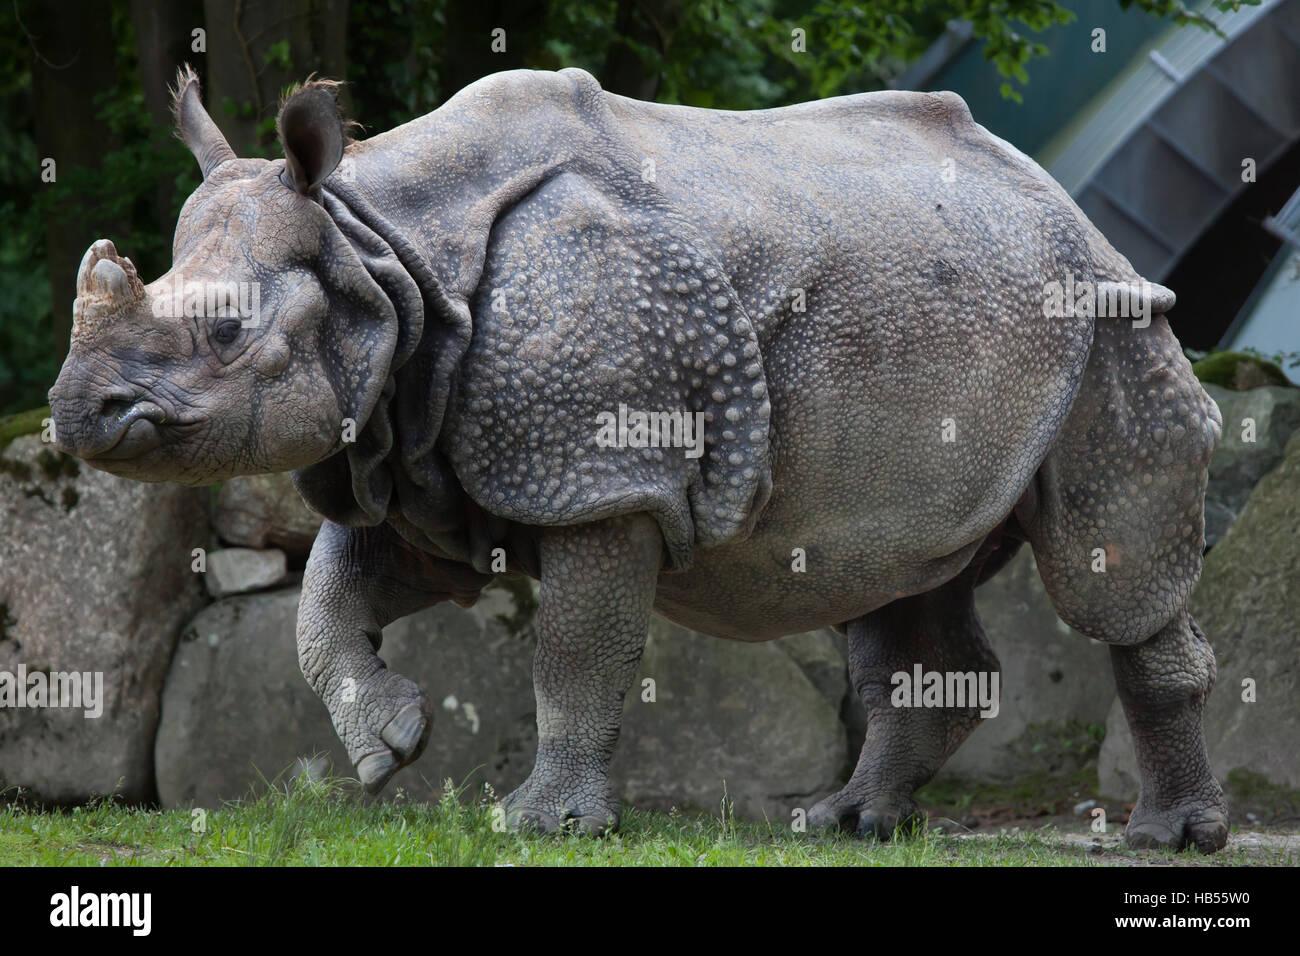 Indian rhinoceros (Rhinoceros unicornis) at Hellabrunn Zoo in Munich, Bavaria, Germany. - Stock Image